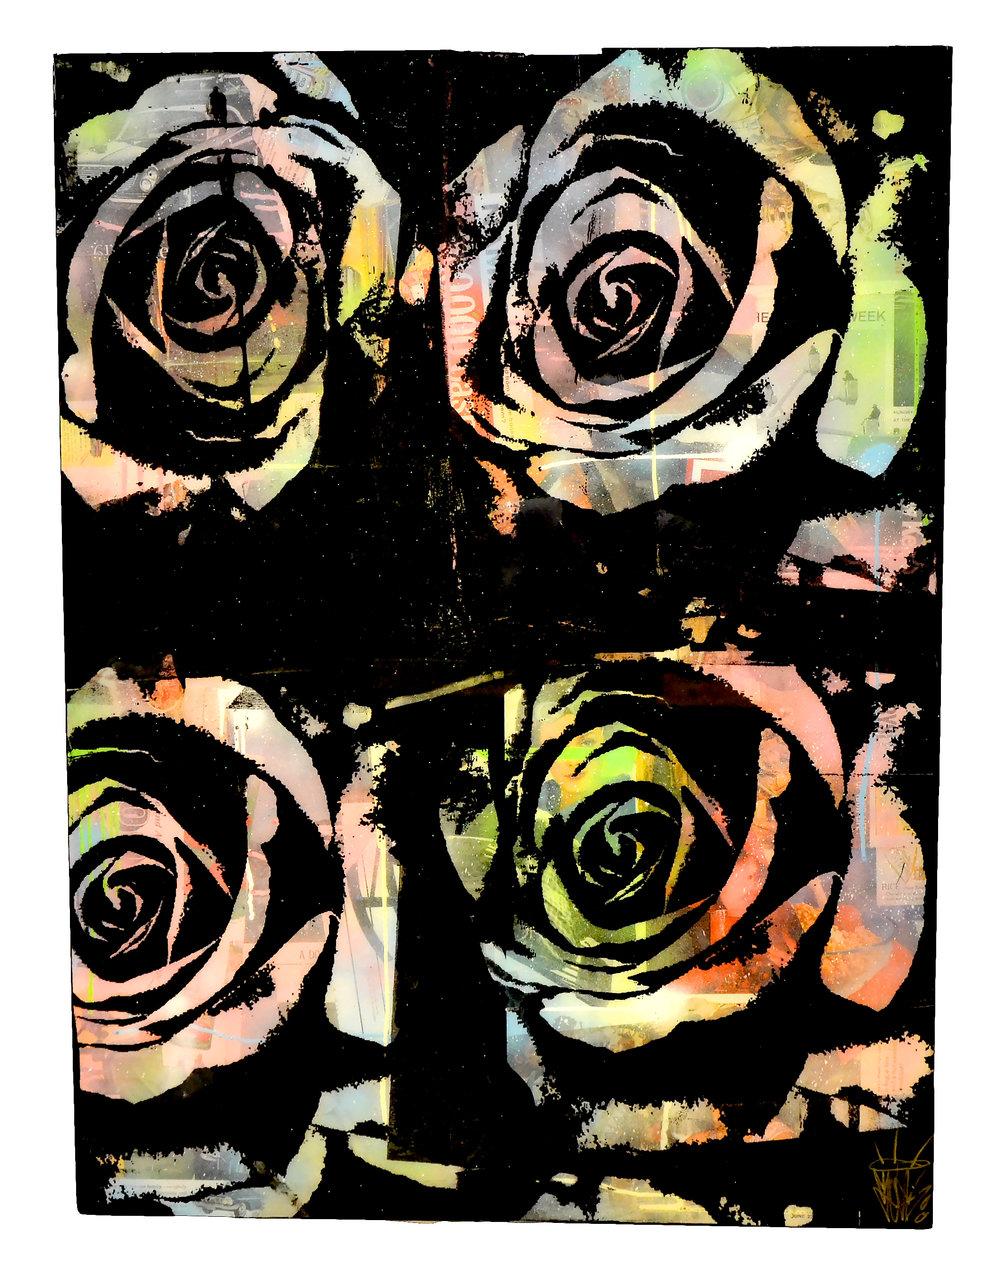 Abstract Rose FINAL.jpg